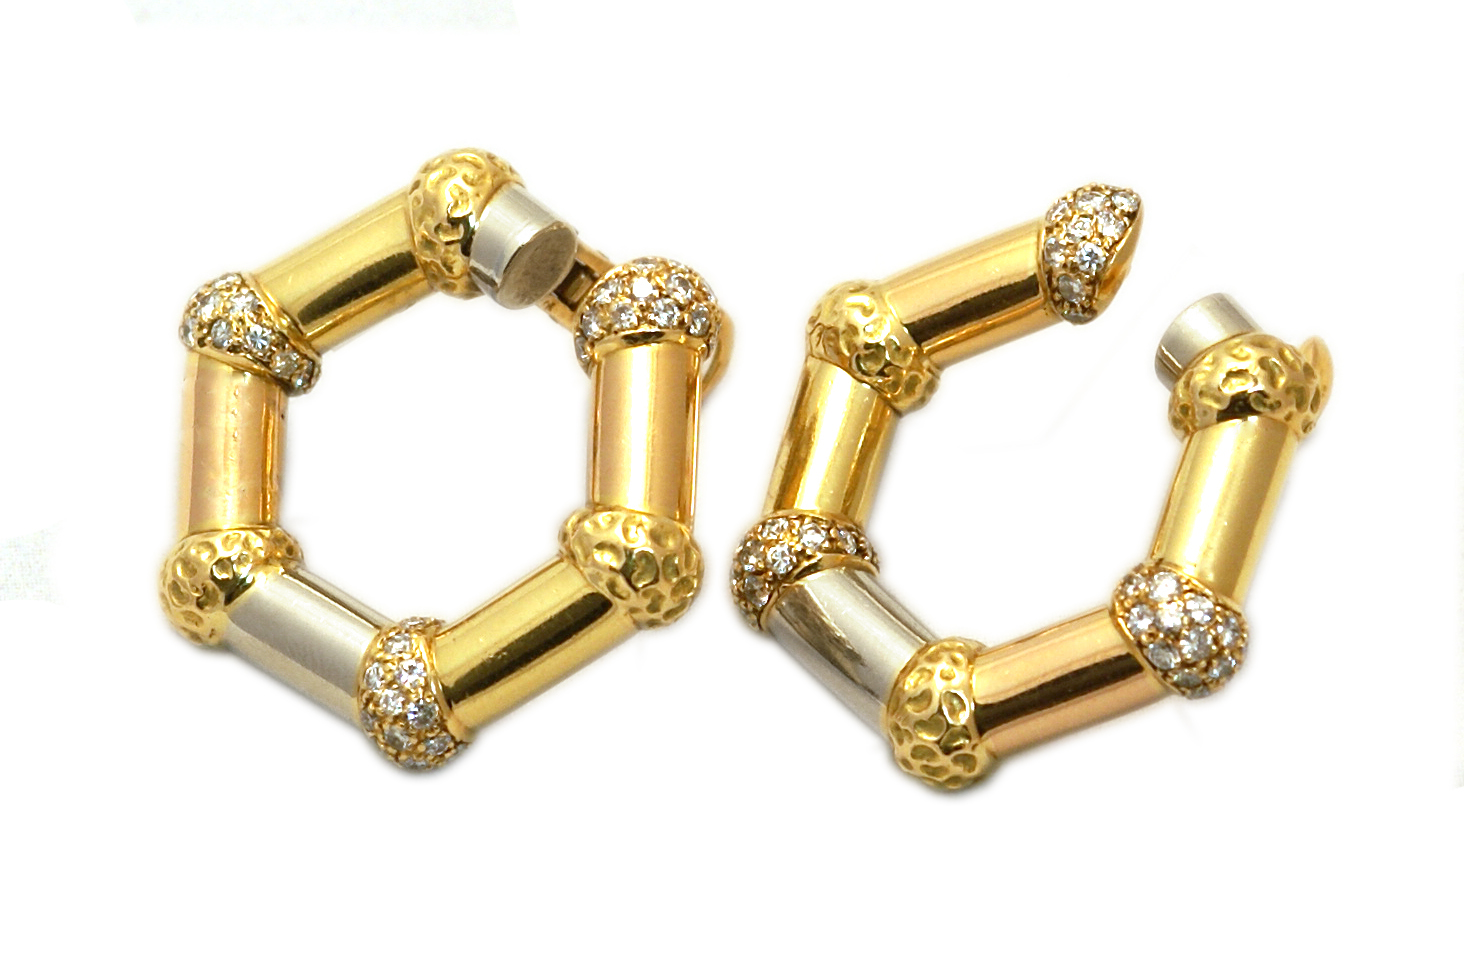 Rare Bulgari New York Three Gold Ear Clips - Eleuteri